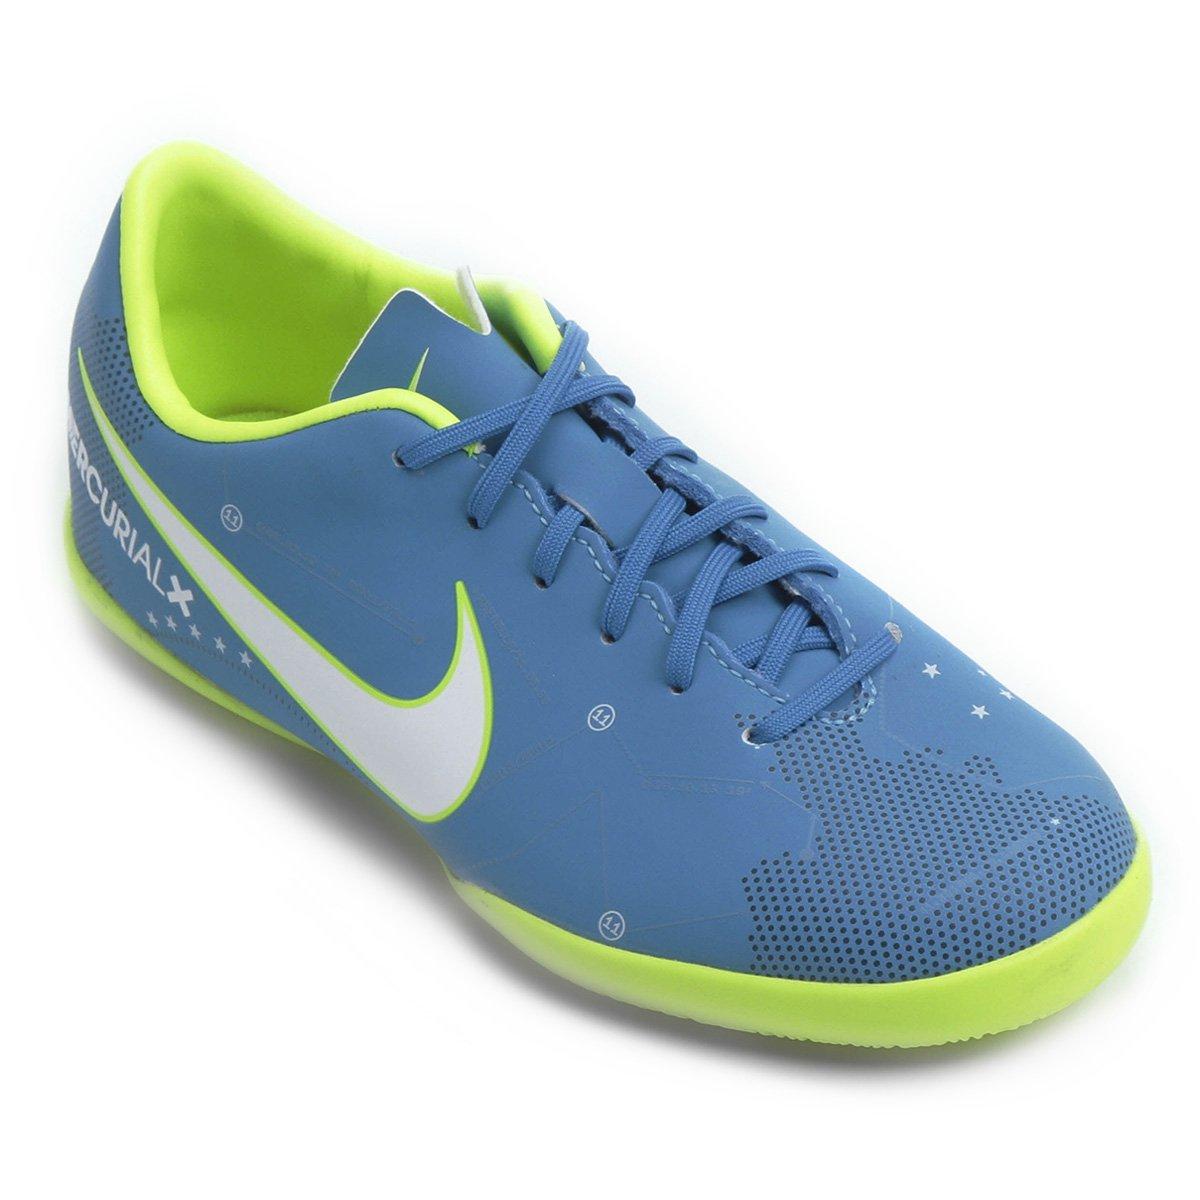 Chuteira Futsal Infantil Nike Mercurial Victory 6 Neymar Jr IC fd7a24f6e3f27